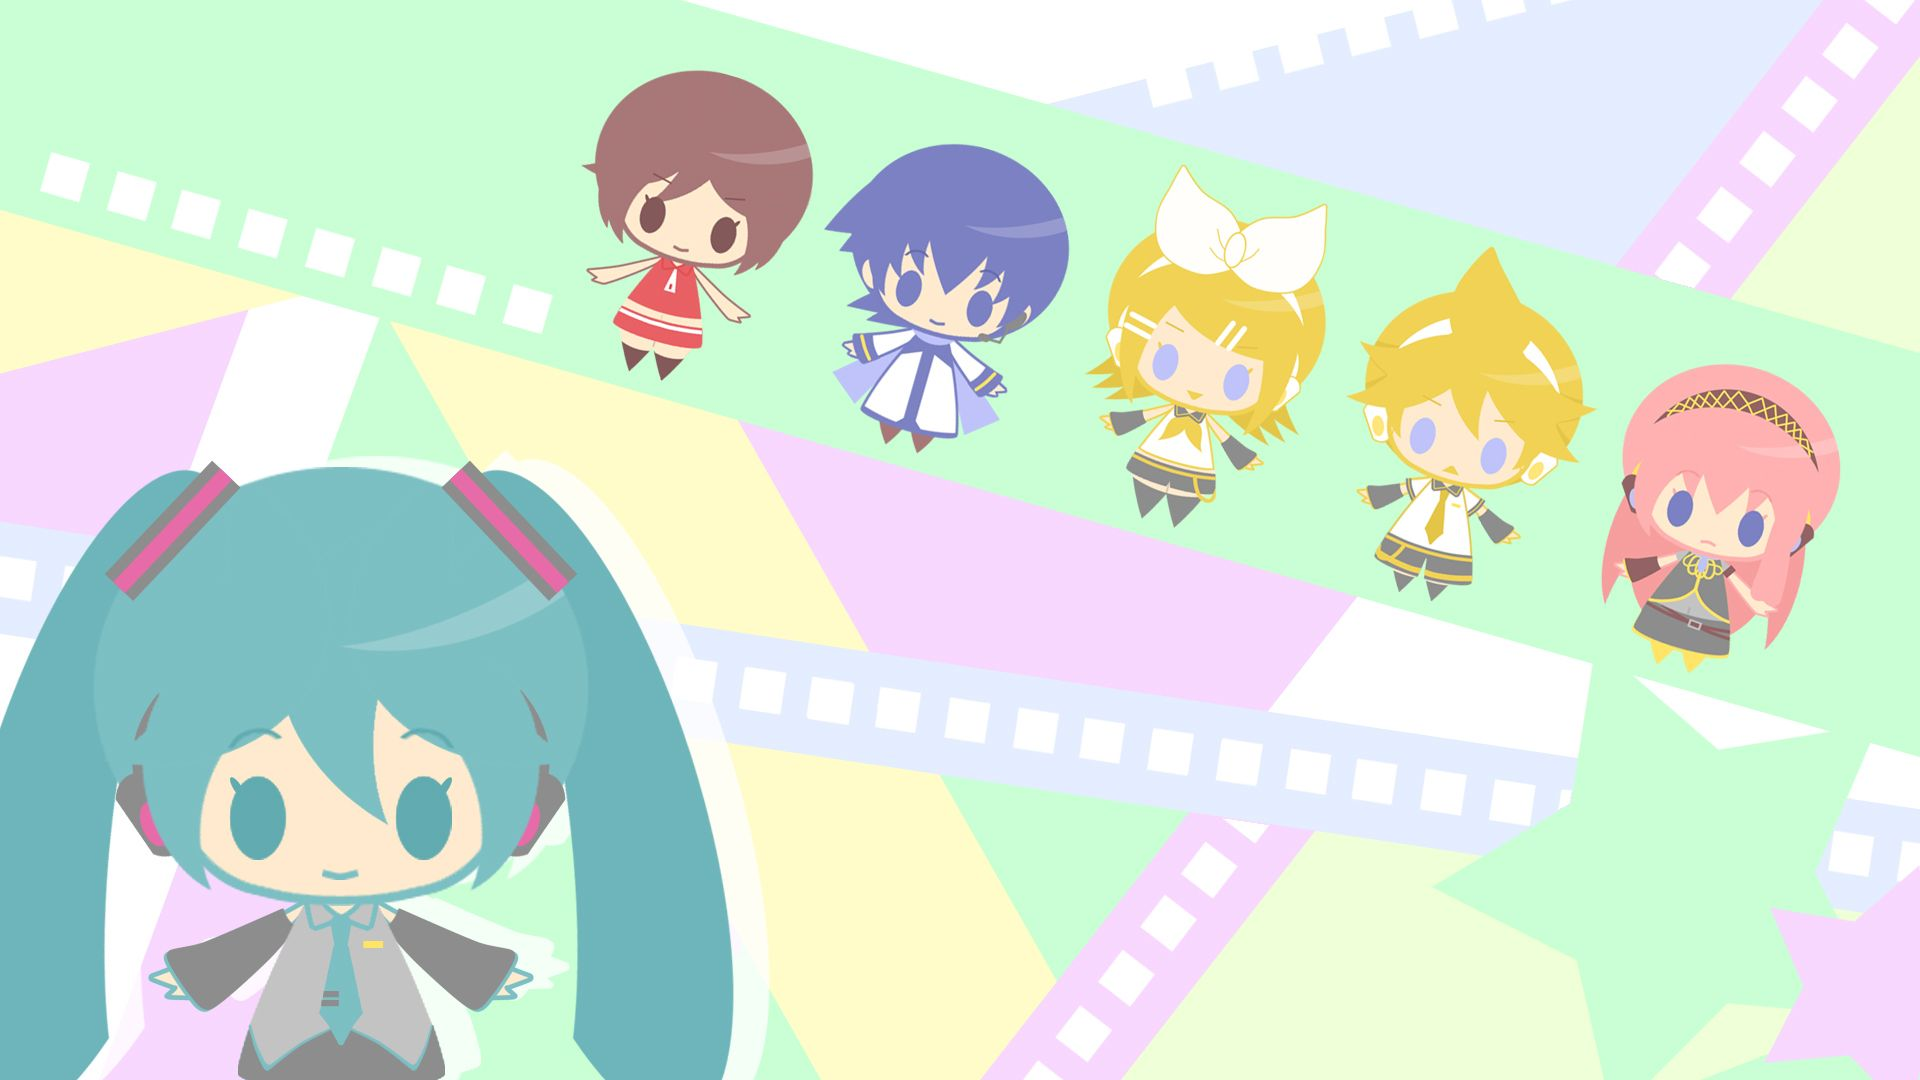 Anime kawaii wallpapers wallpapers backgrounds images art photos products i love anime - Kawaii wallpaper hd ...